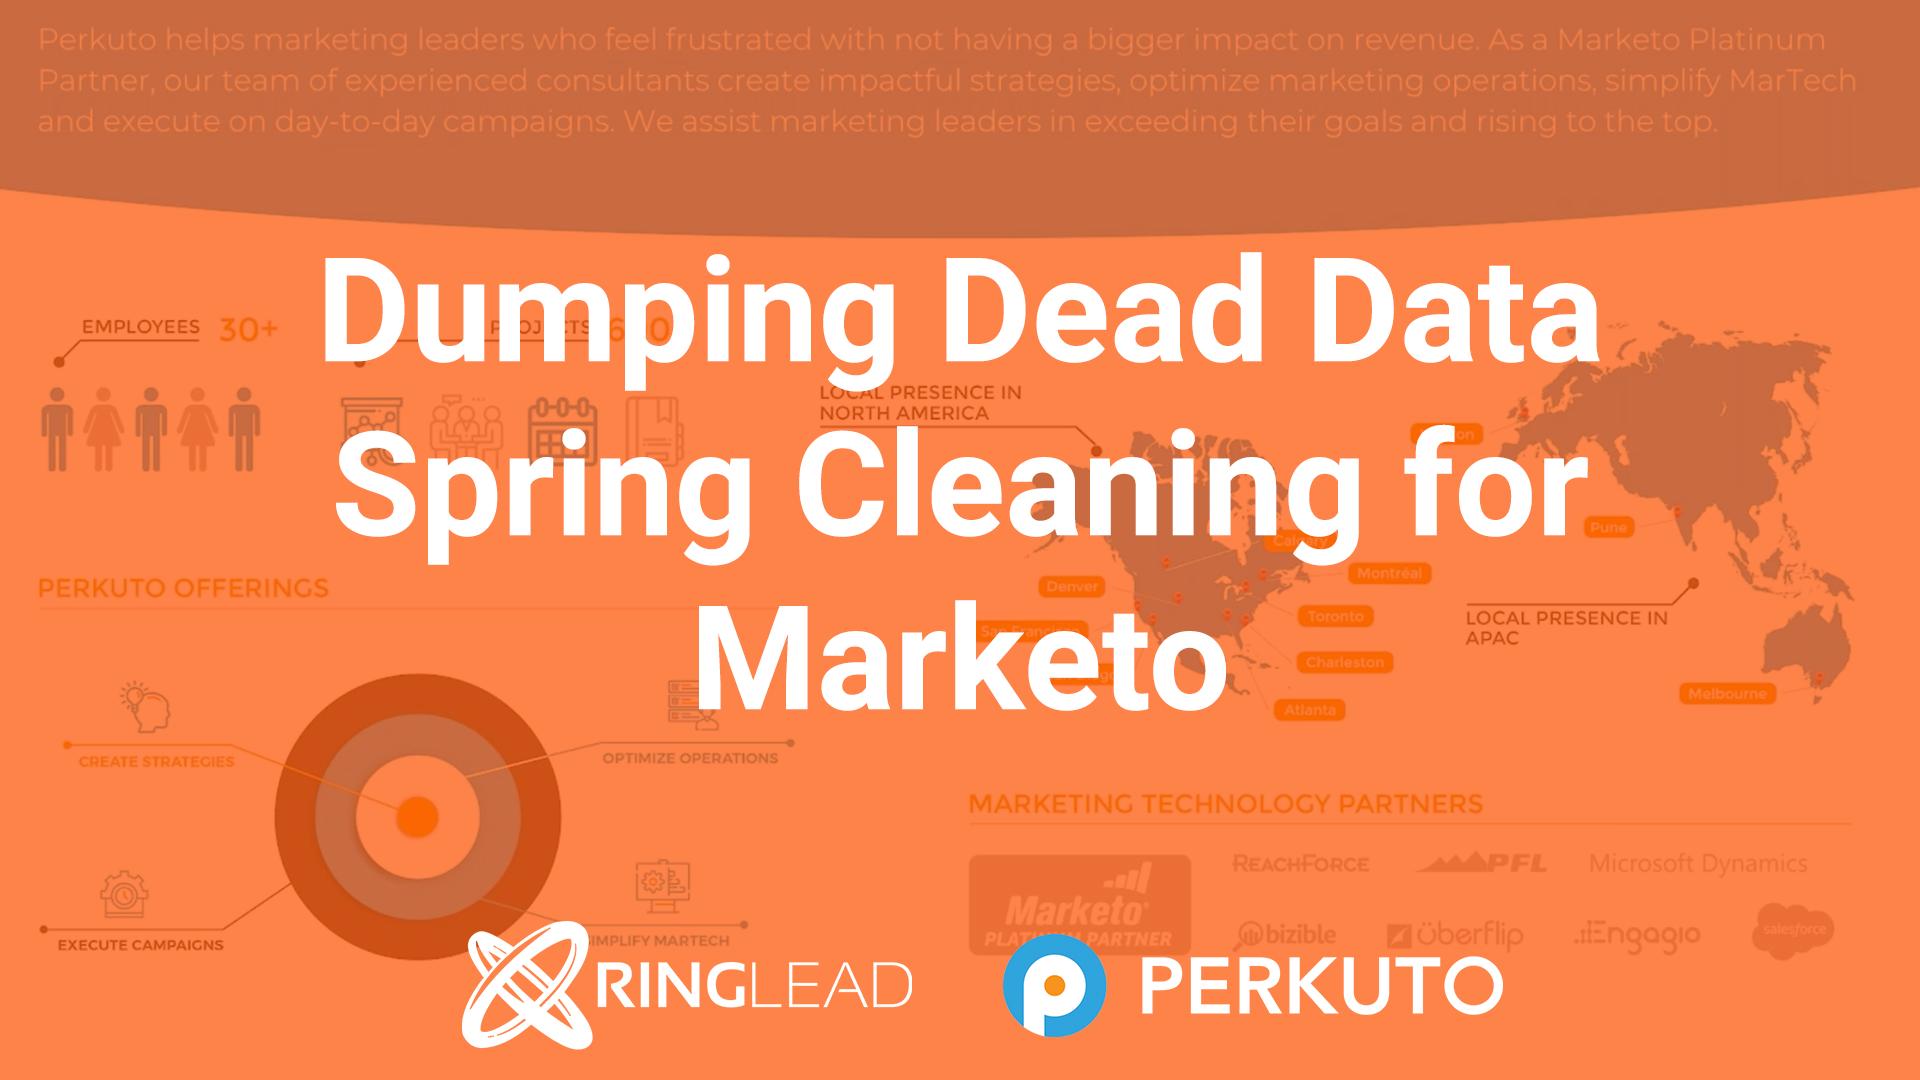 Dumping Dead Data & Spring Cleaning for Marketo